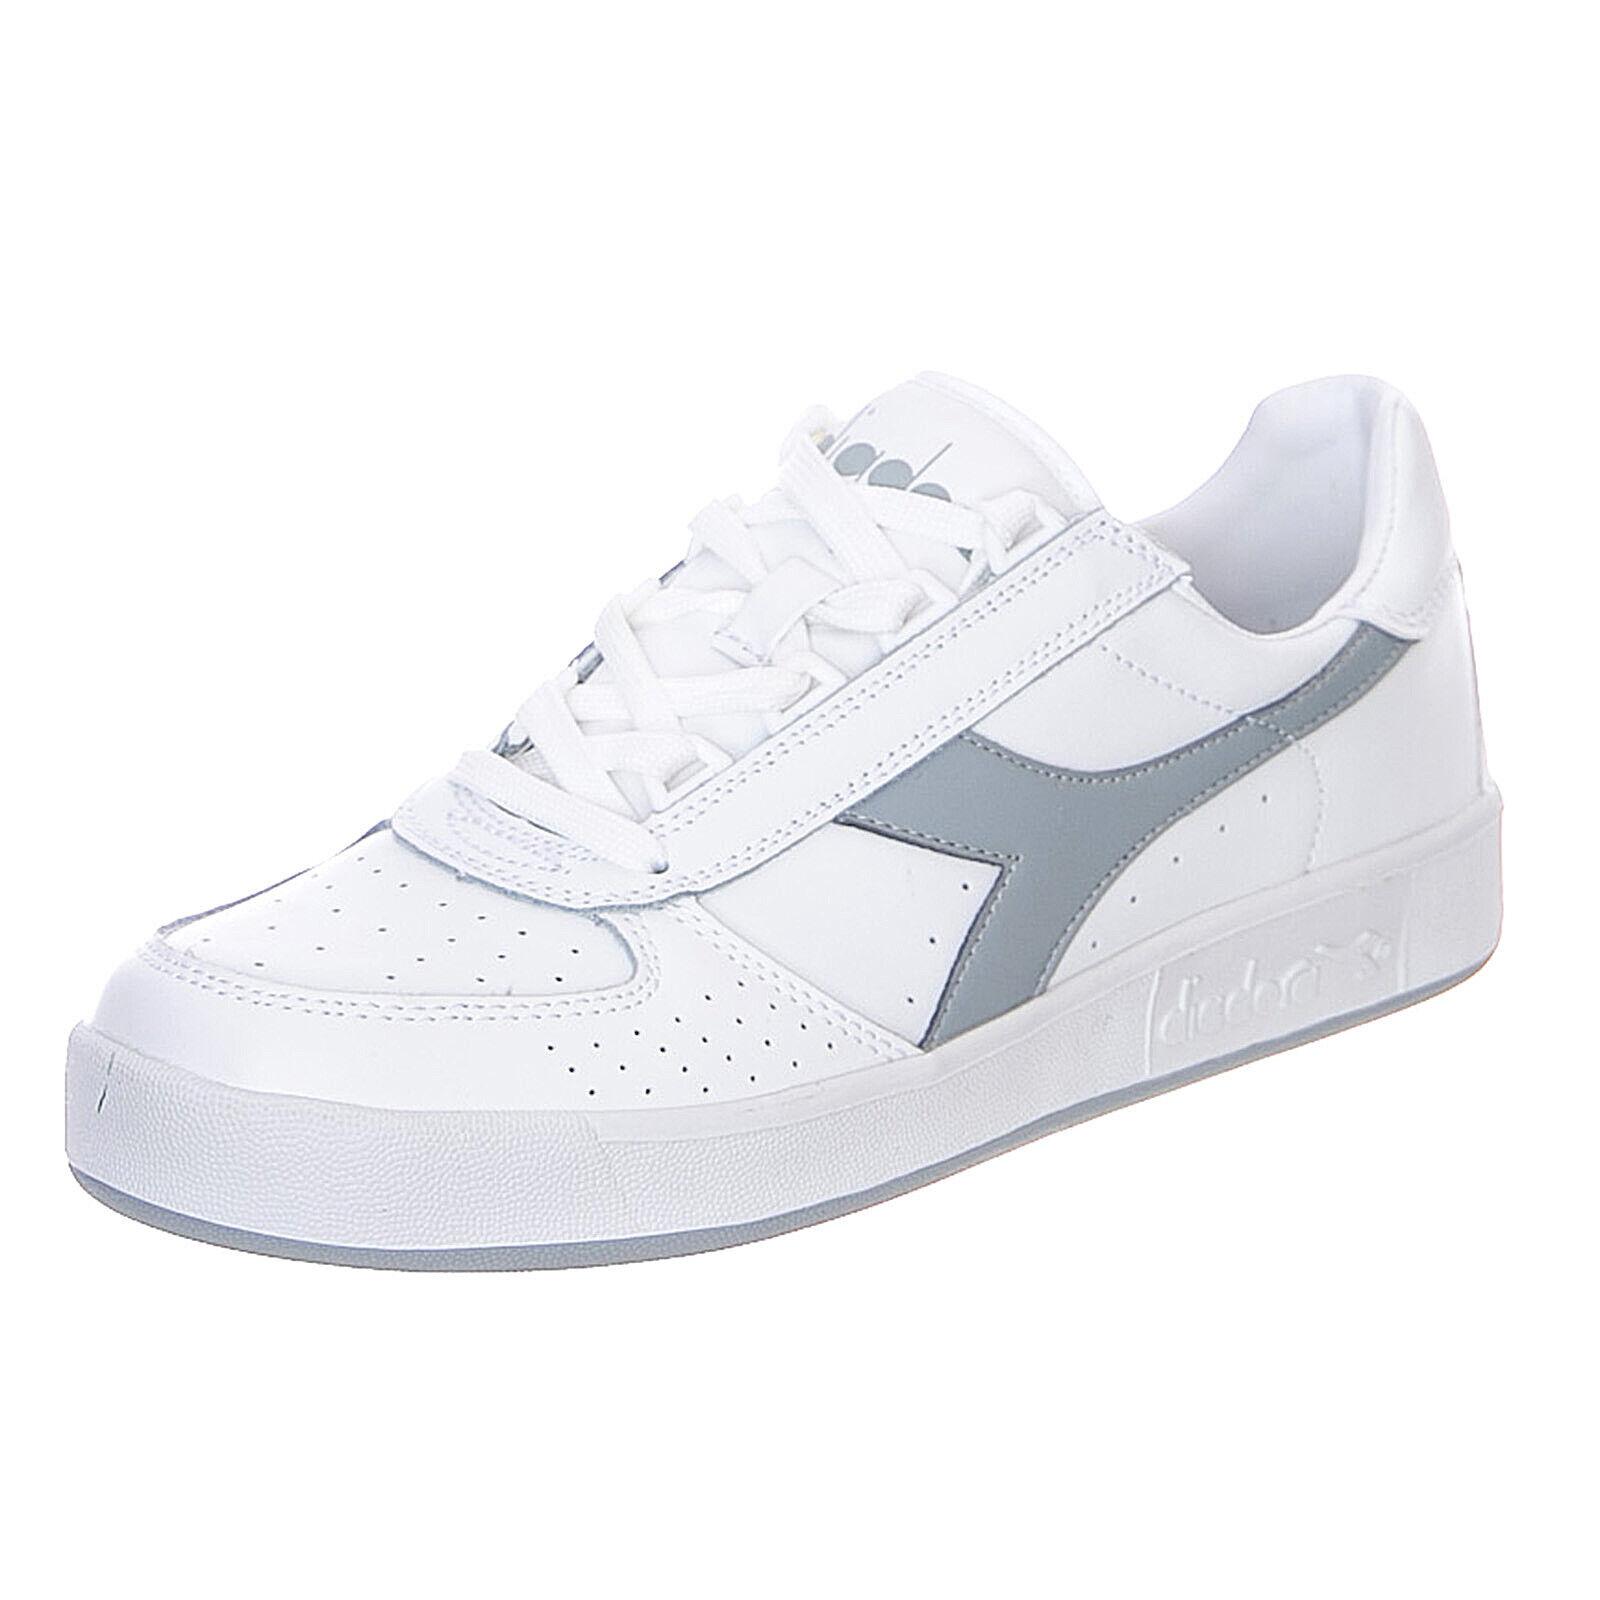 Diadora b-elite - weiß grau - Turnschuhe niedrig Weißer Mann